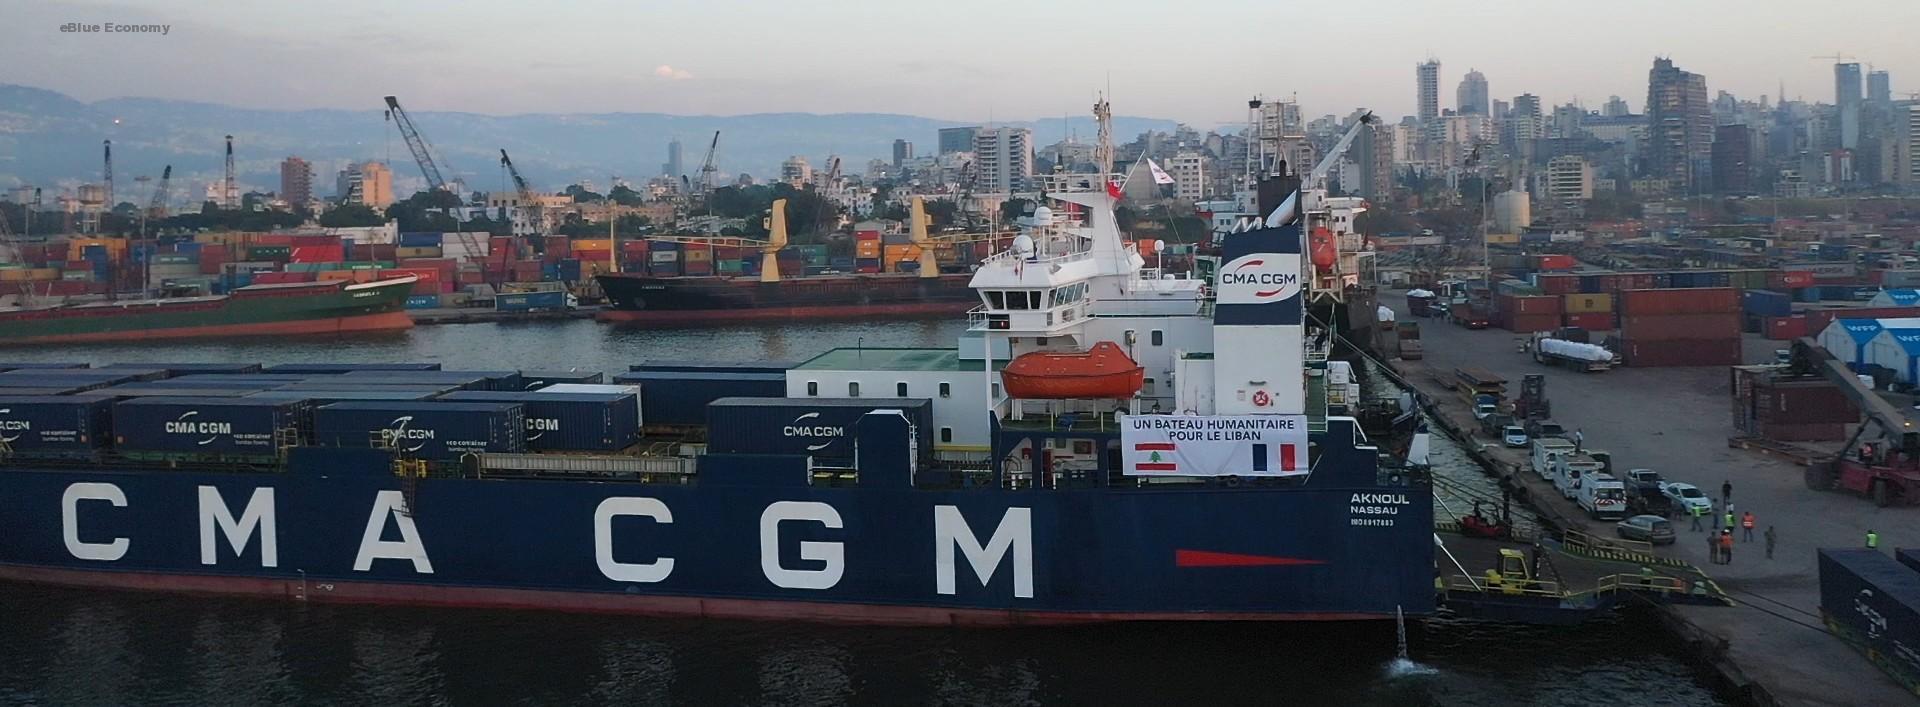 eBlue_economy_Macron praises initiative CMA CGM in port Beirut